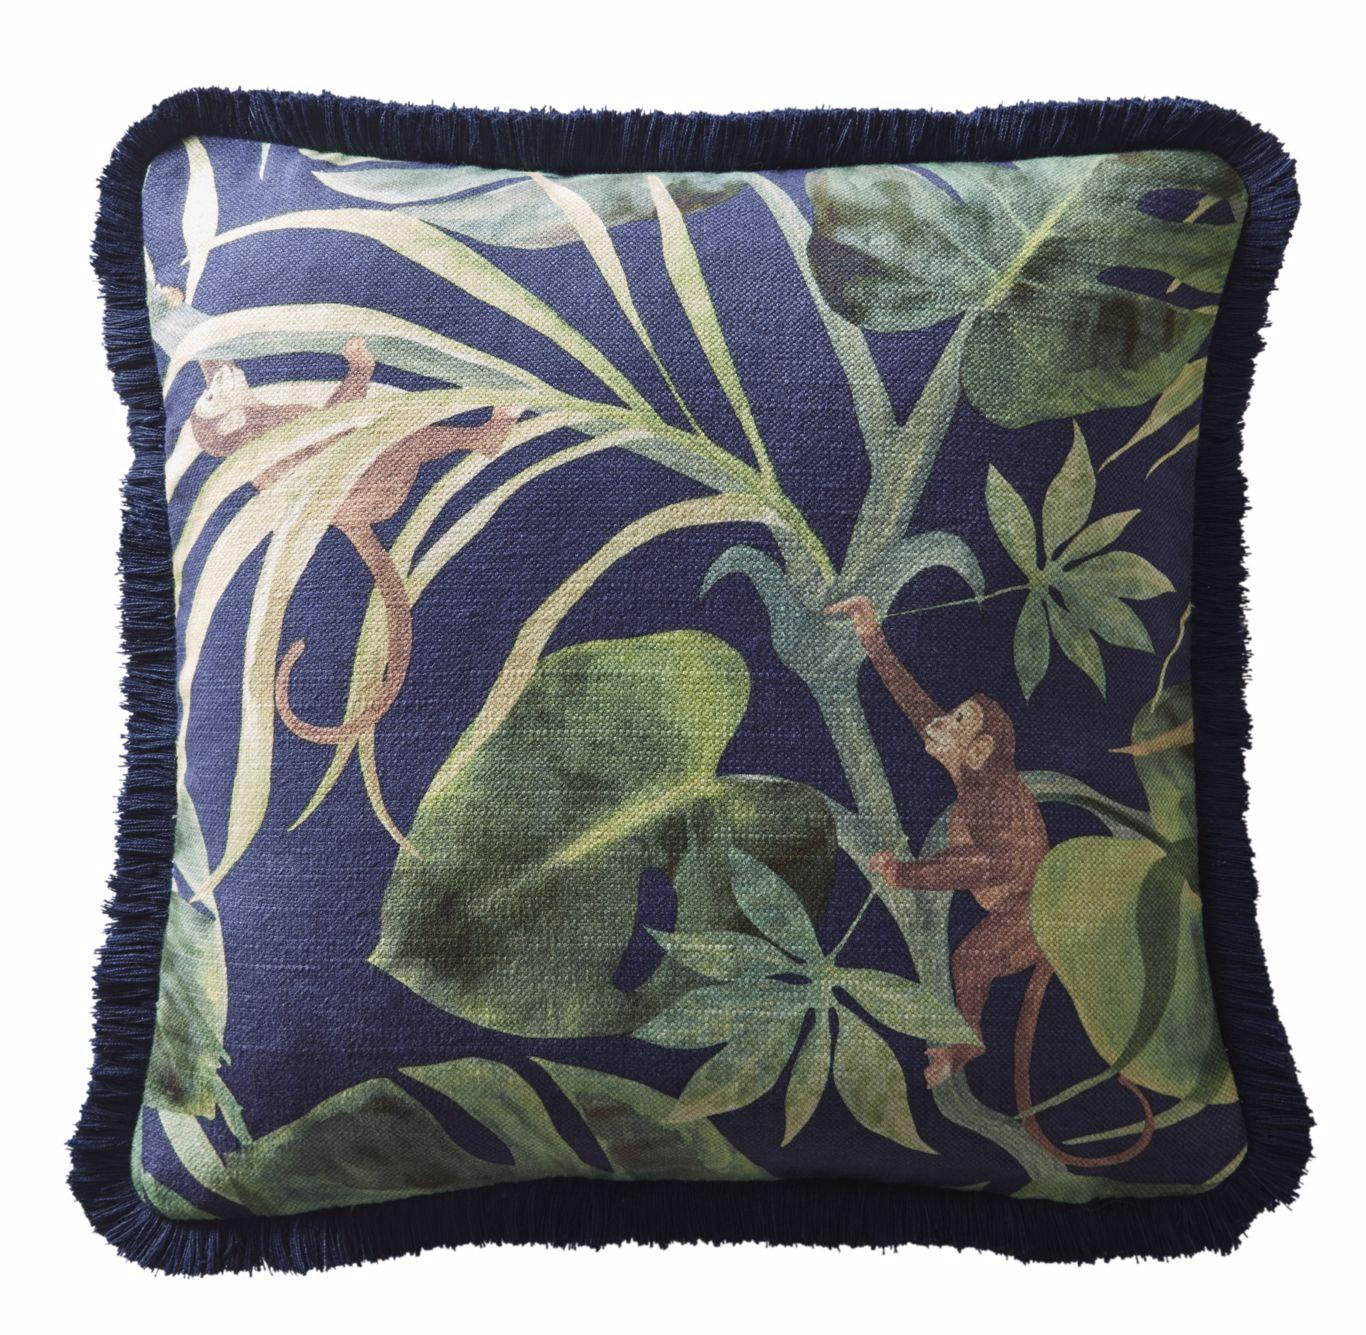 Monkey Business Cushion by CNC